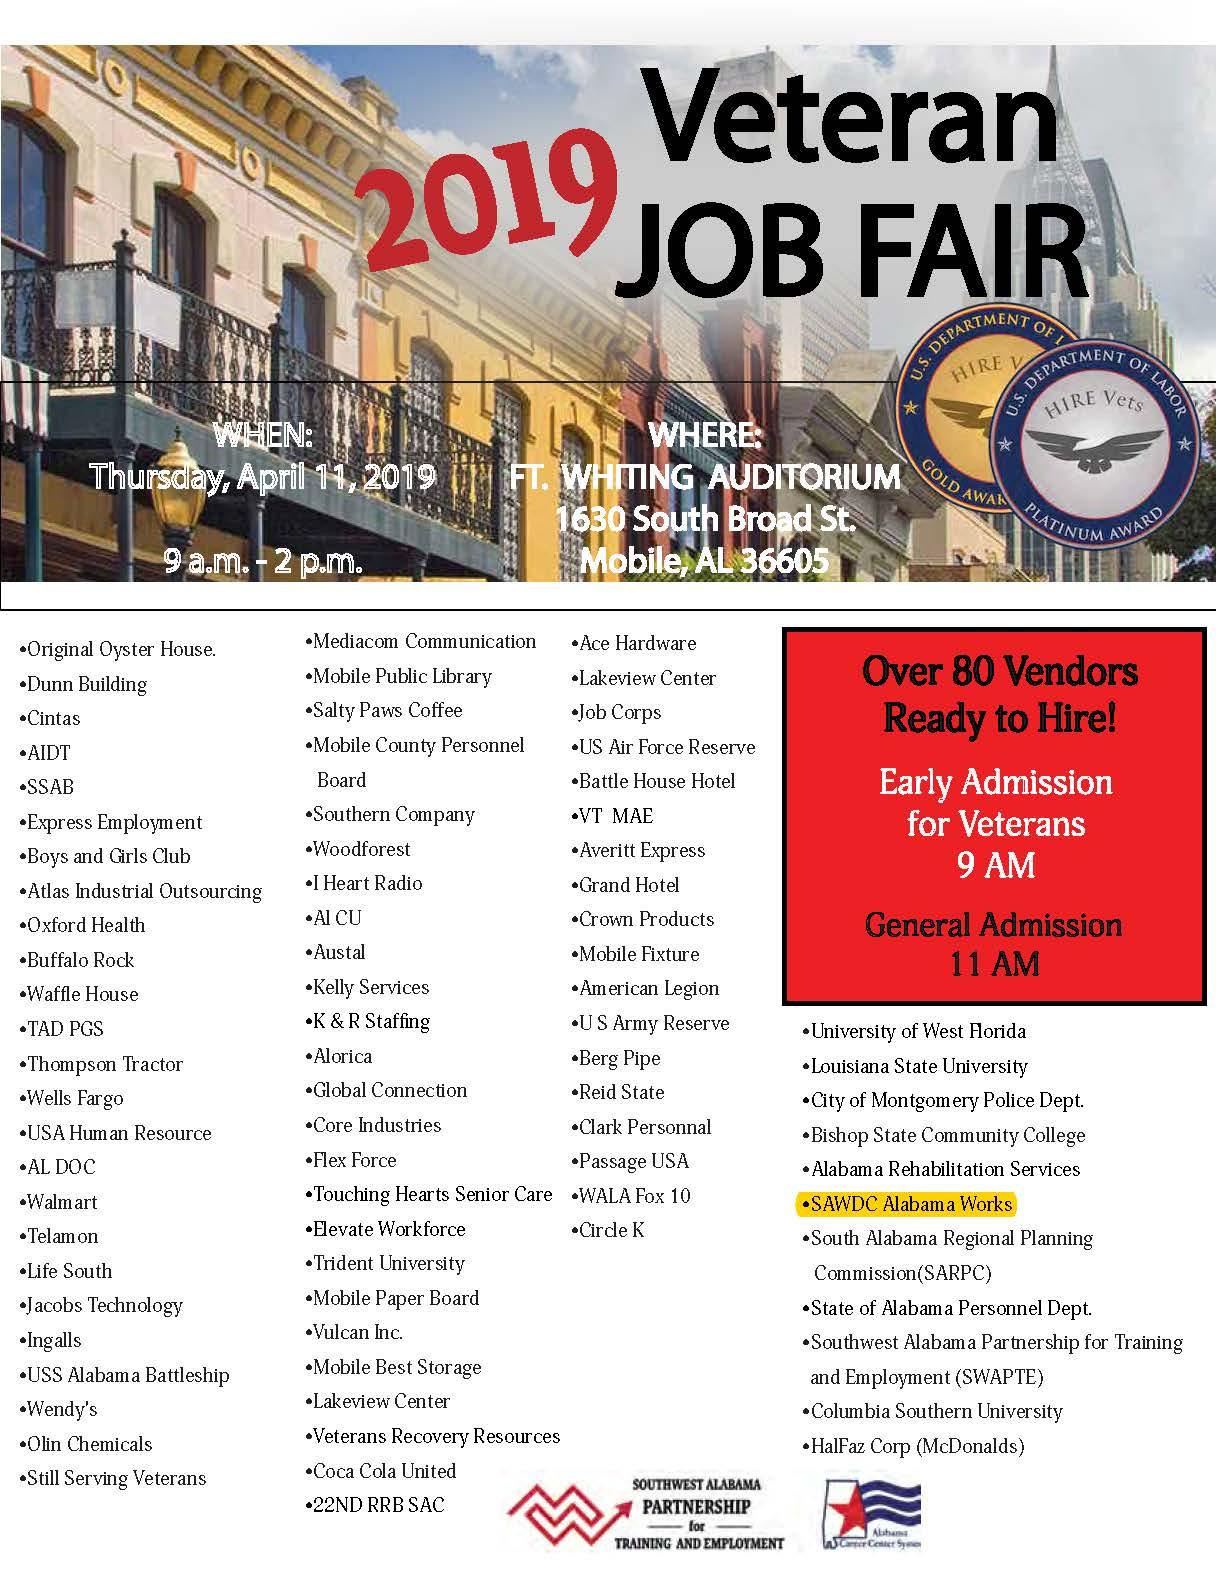 Veterans Job Fair 2019 Revised AA (1).jpg